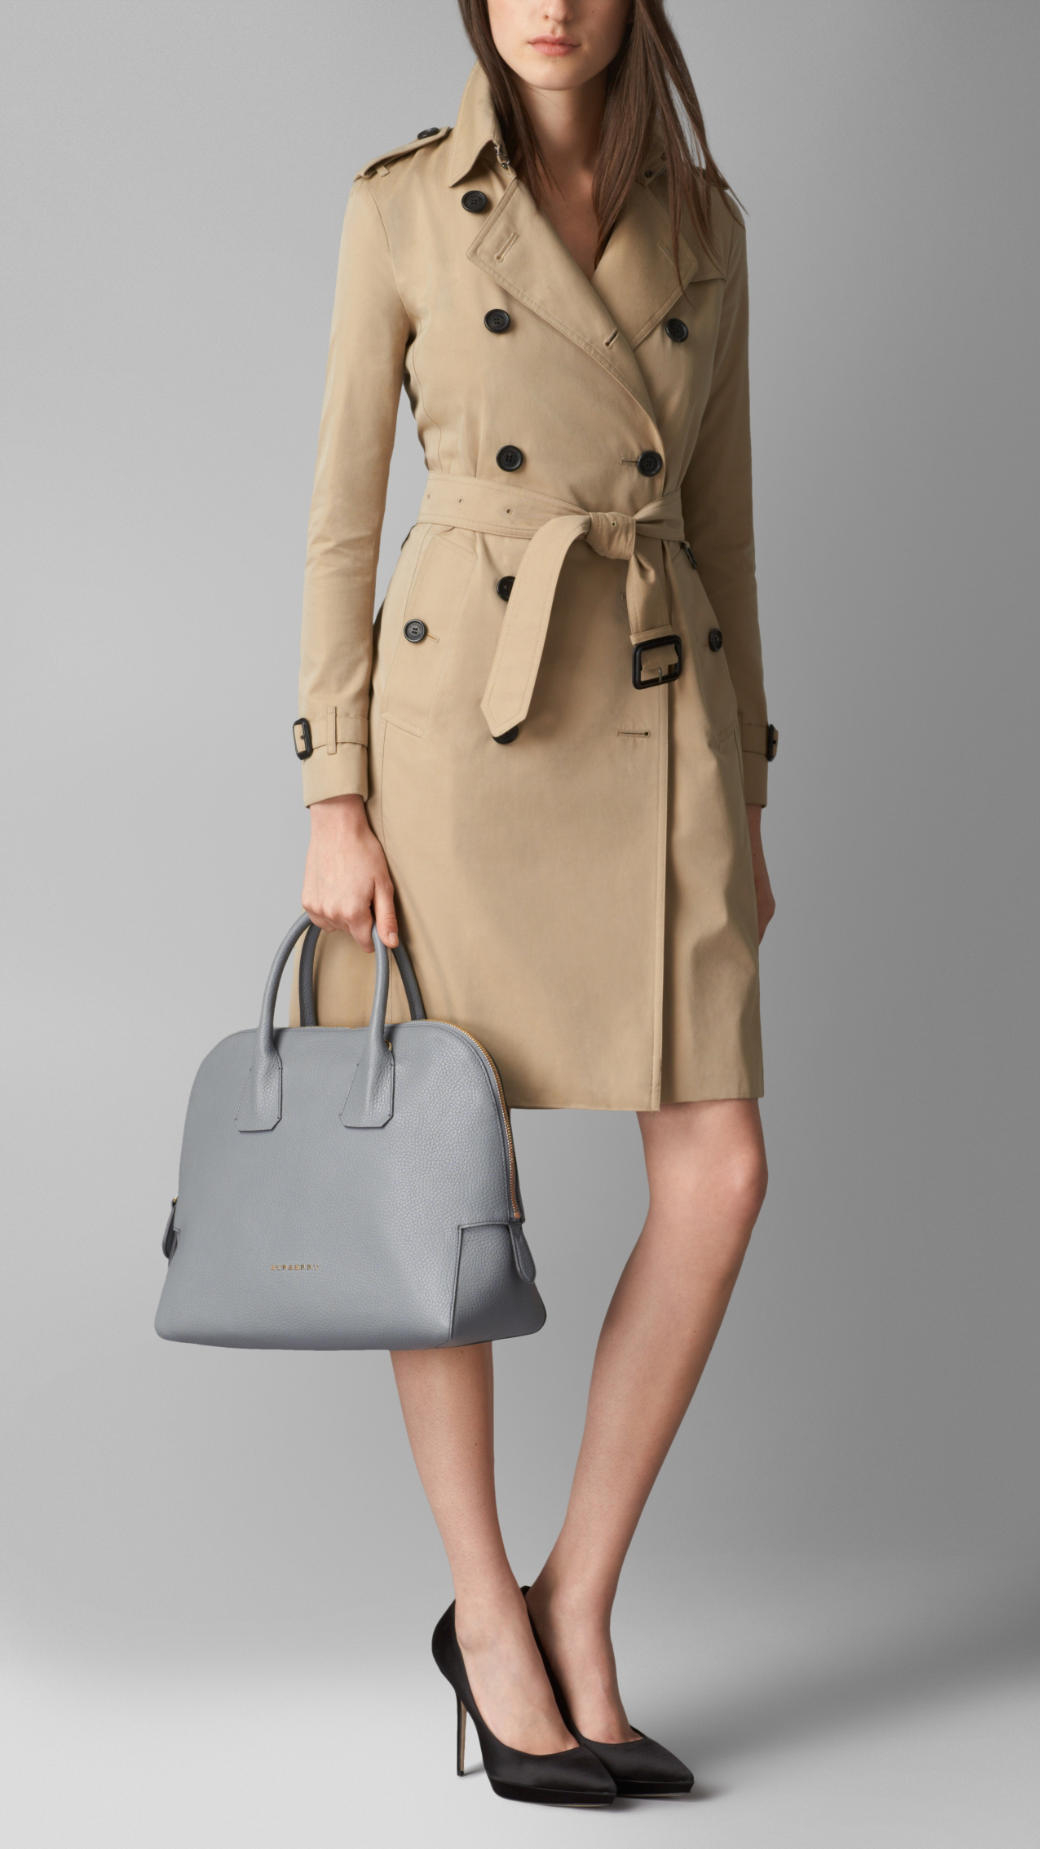 Burberry Small Grainy Leather Bowling Bag in Gray - Lyst fe6dd84ddf542